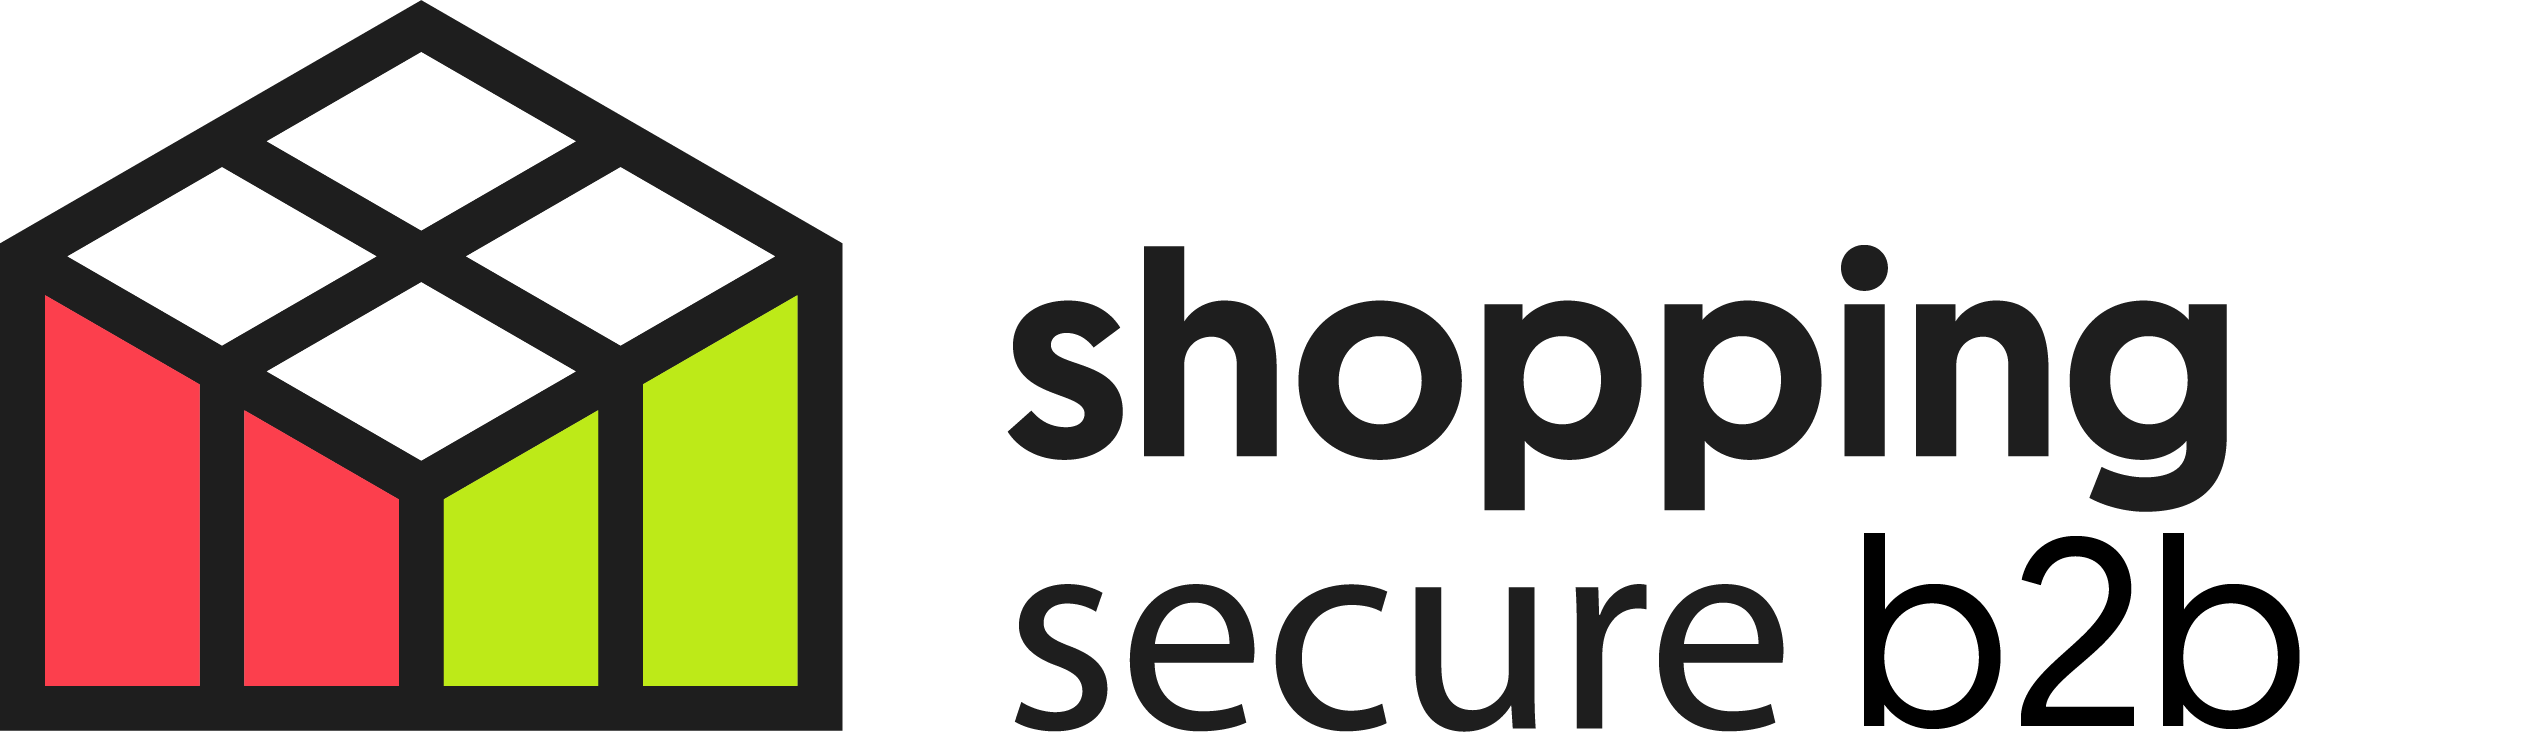 Shopping_Secureb2b_horizontaal_Kleur